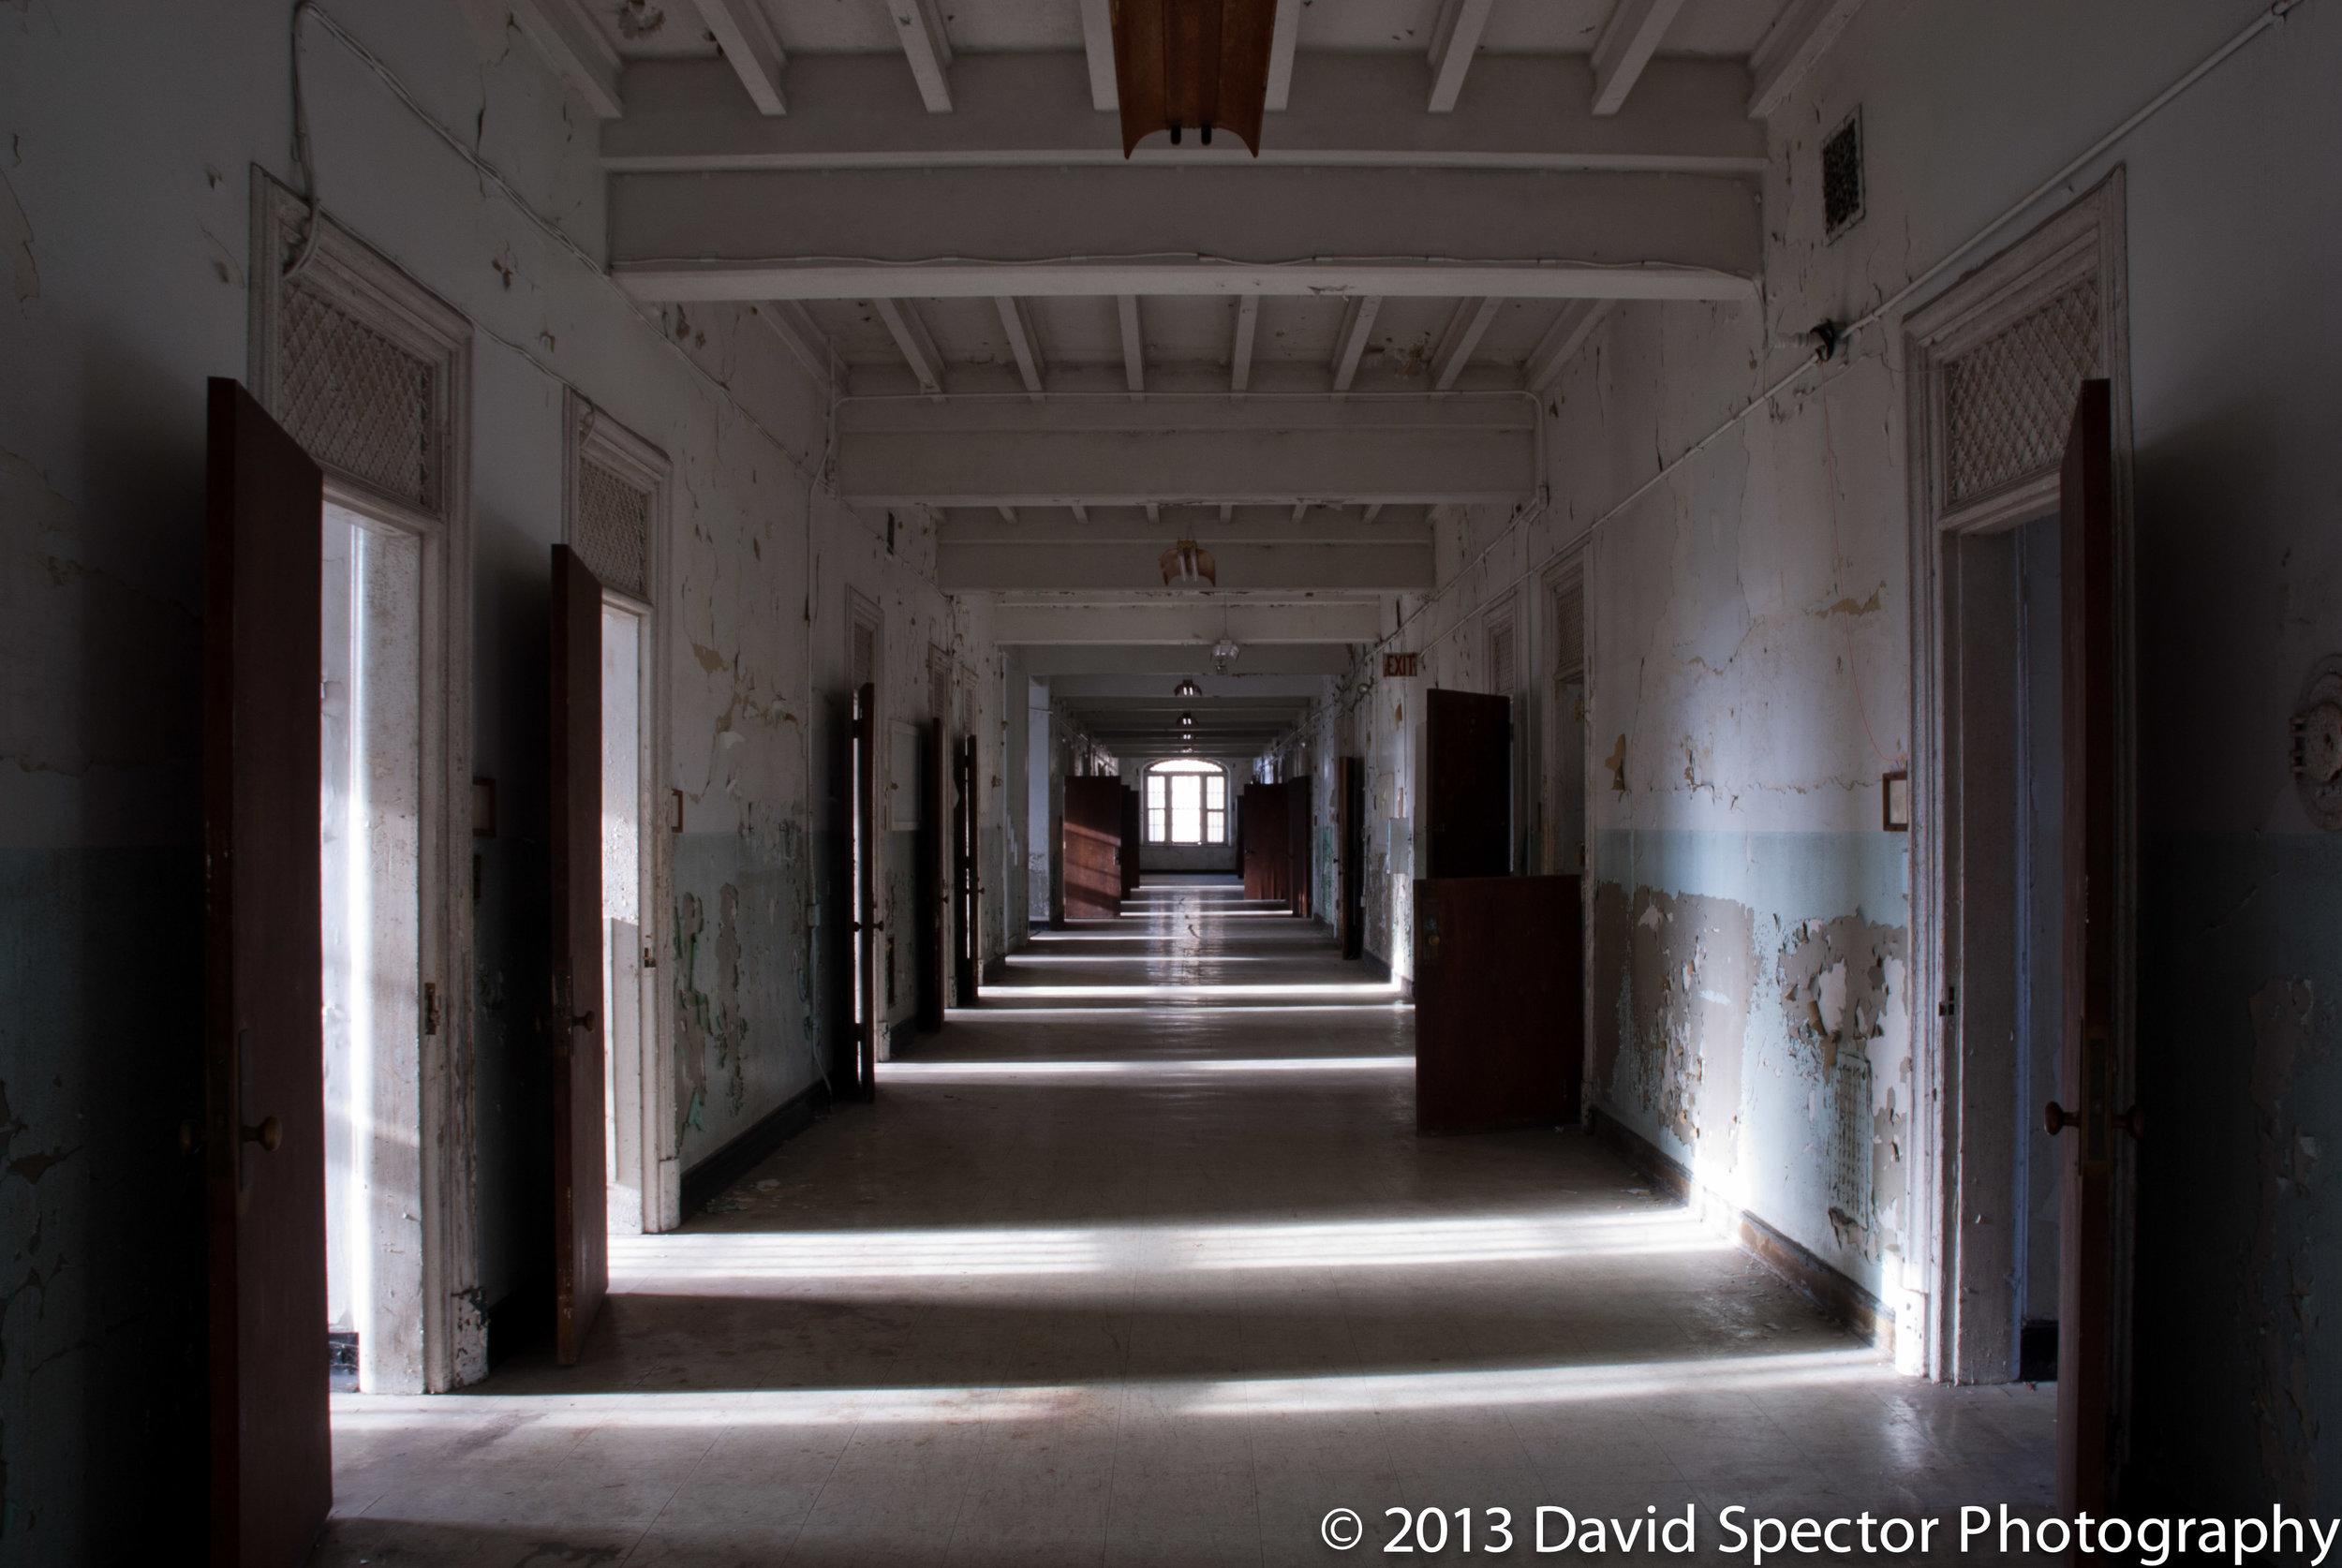 I love long hallways